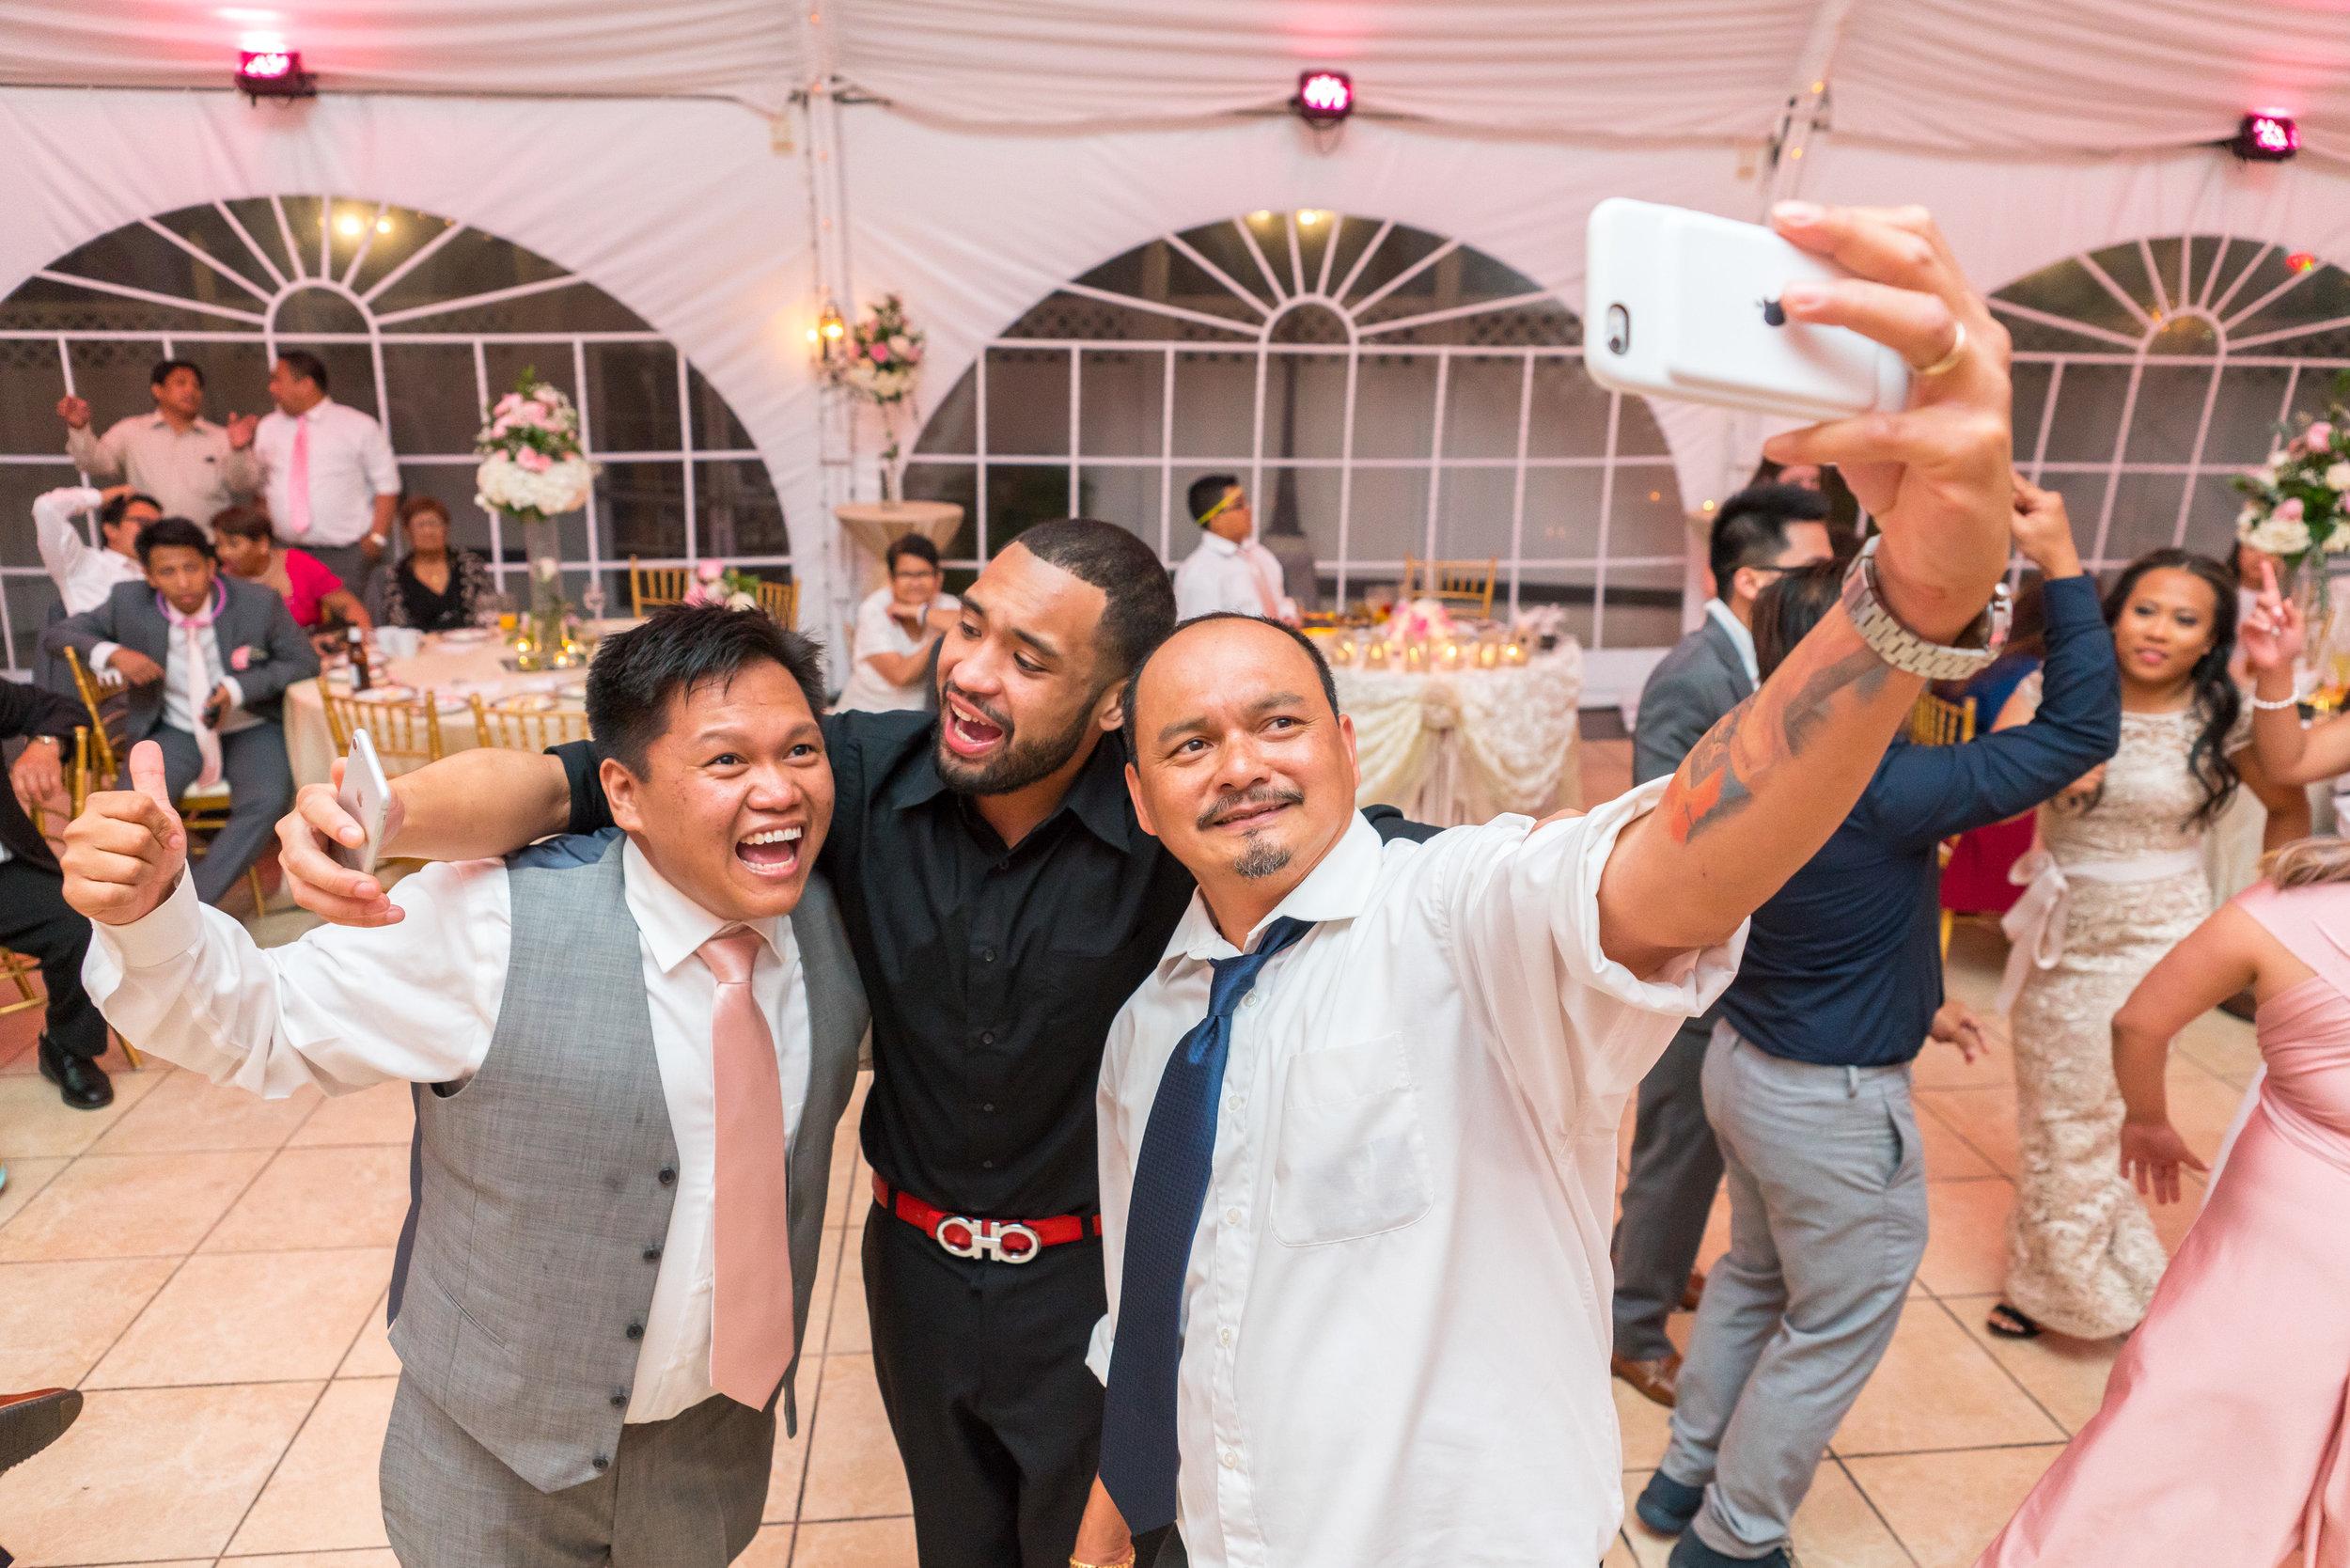 Wedding selfie photo at The Villa in Beltsville